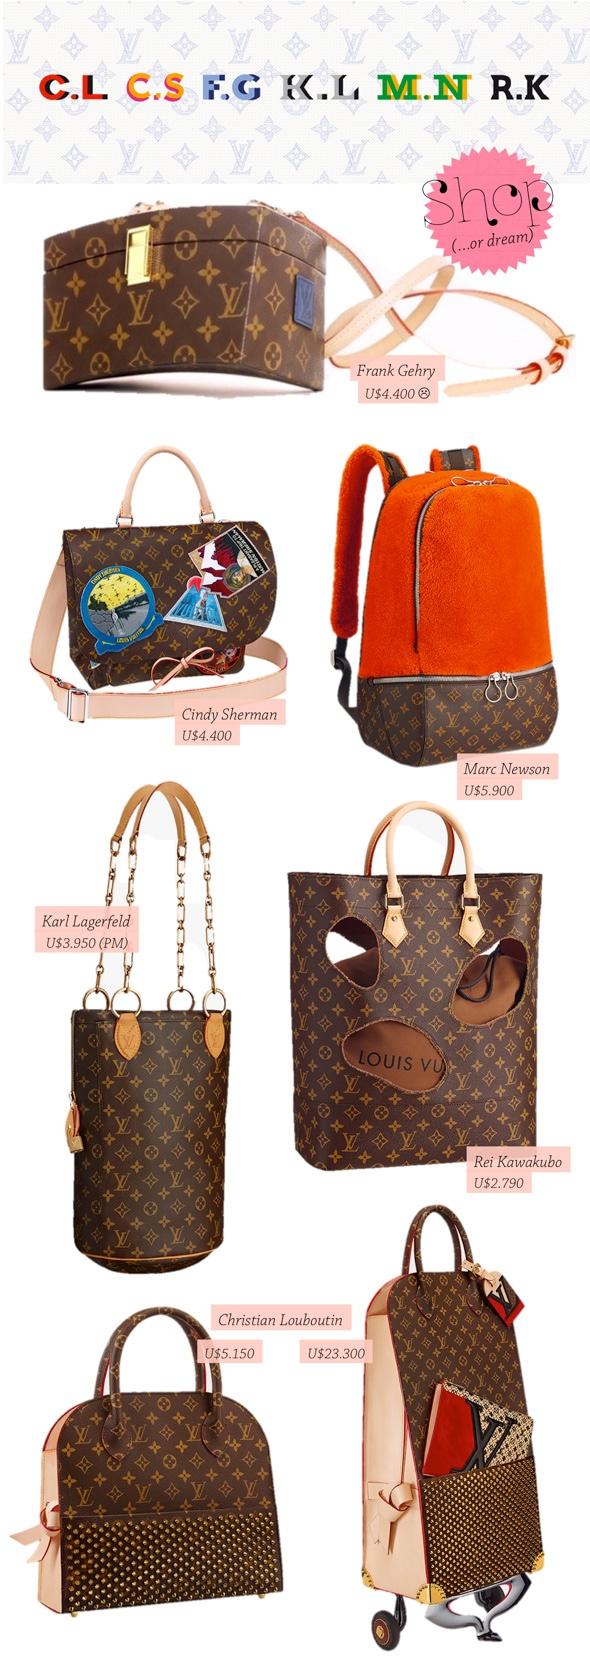 iconoclasts-shop-price-bags-louis-vuitton